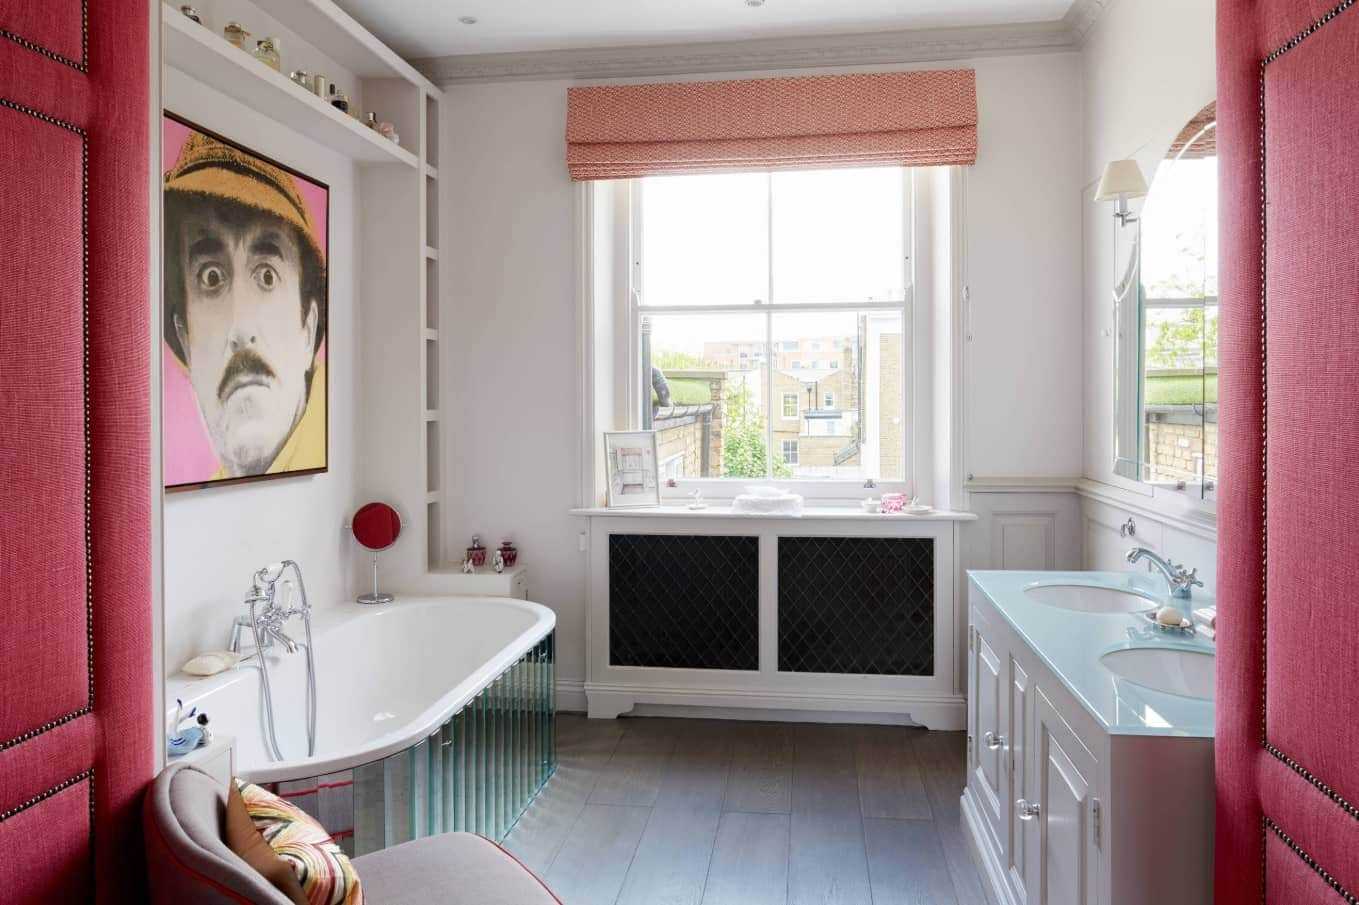 Eclectic Bathroom Style